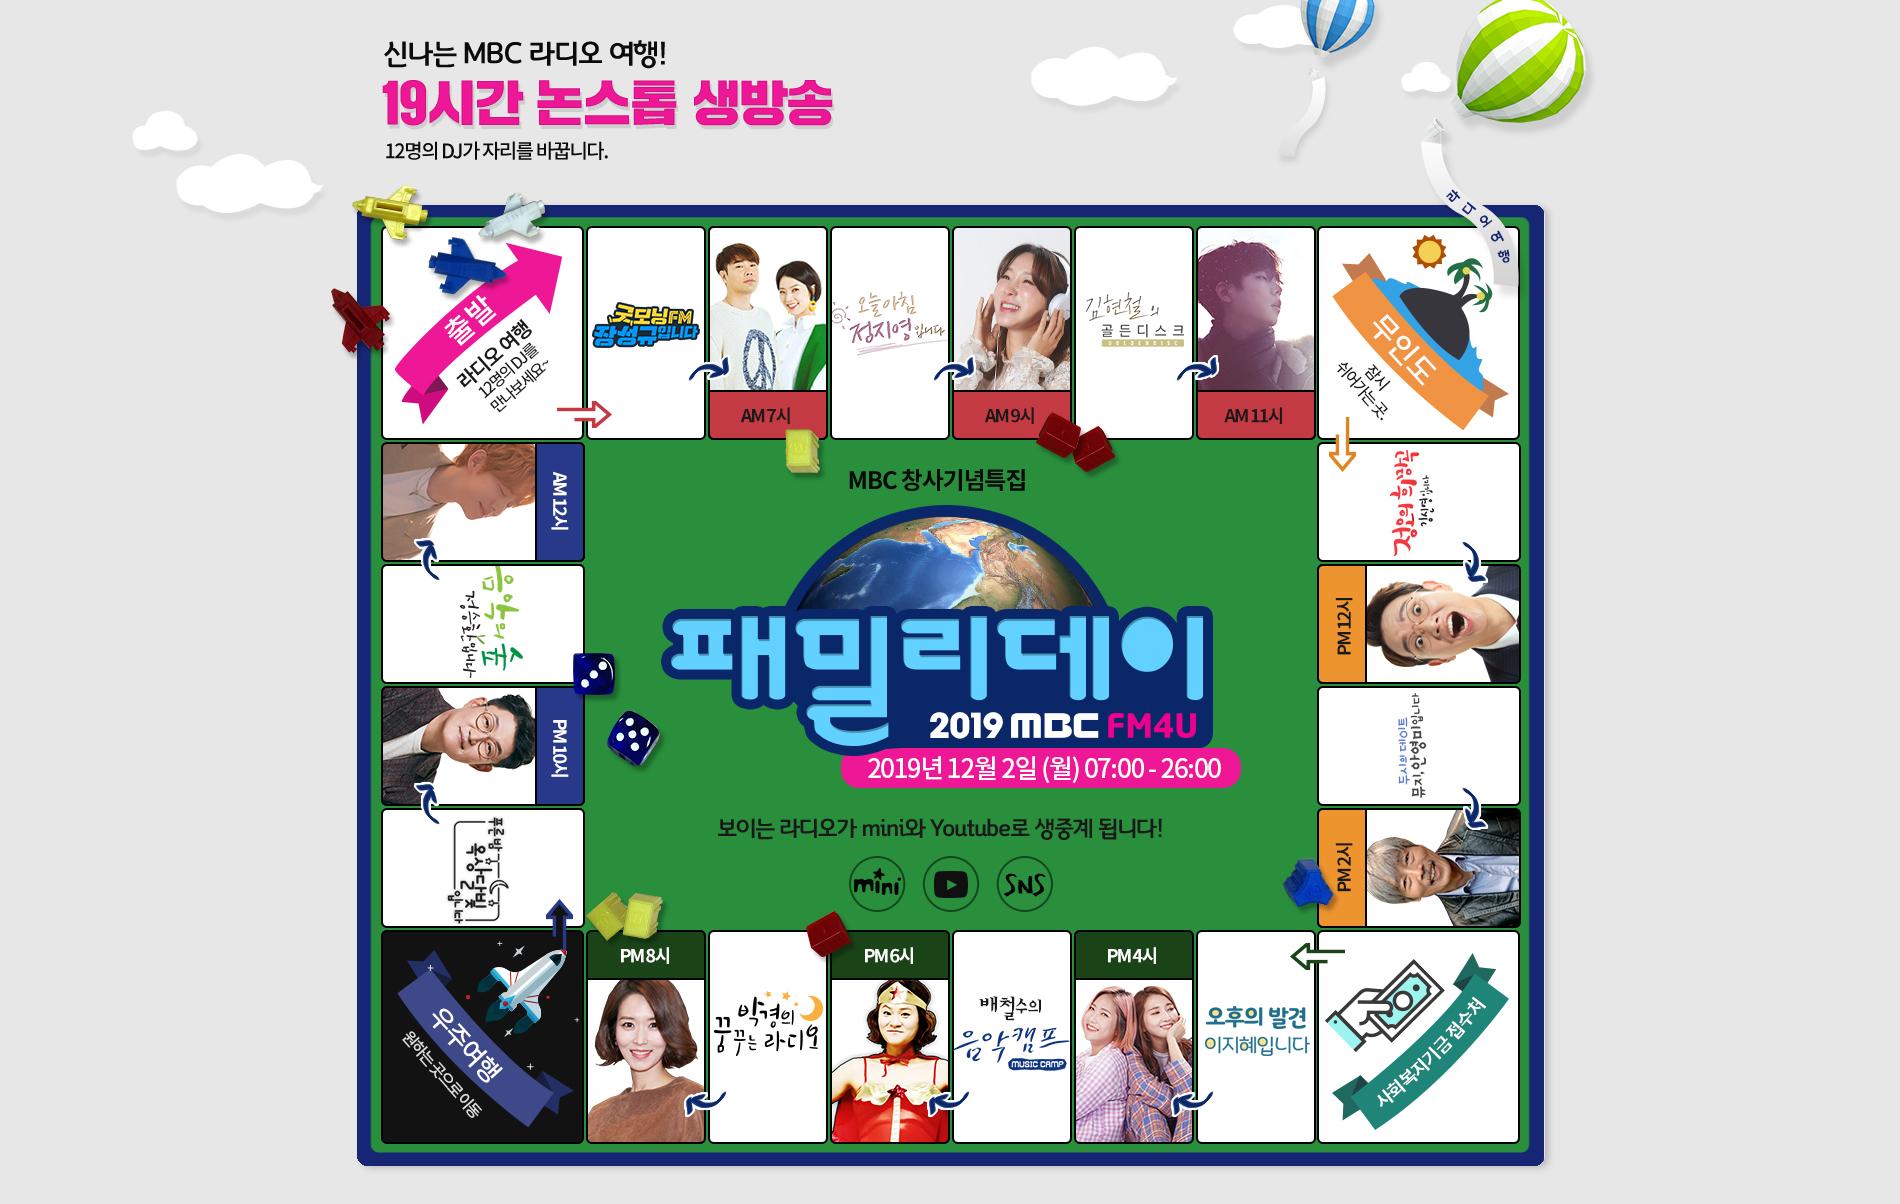 'MBC FM4U 패밀리데이' 장성규 라디오에 뮤지·안영미가?! 19시간 '논스톱' 생방송